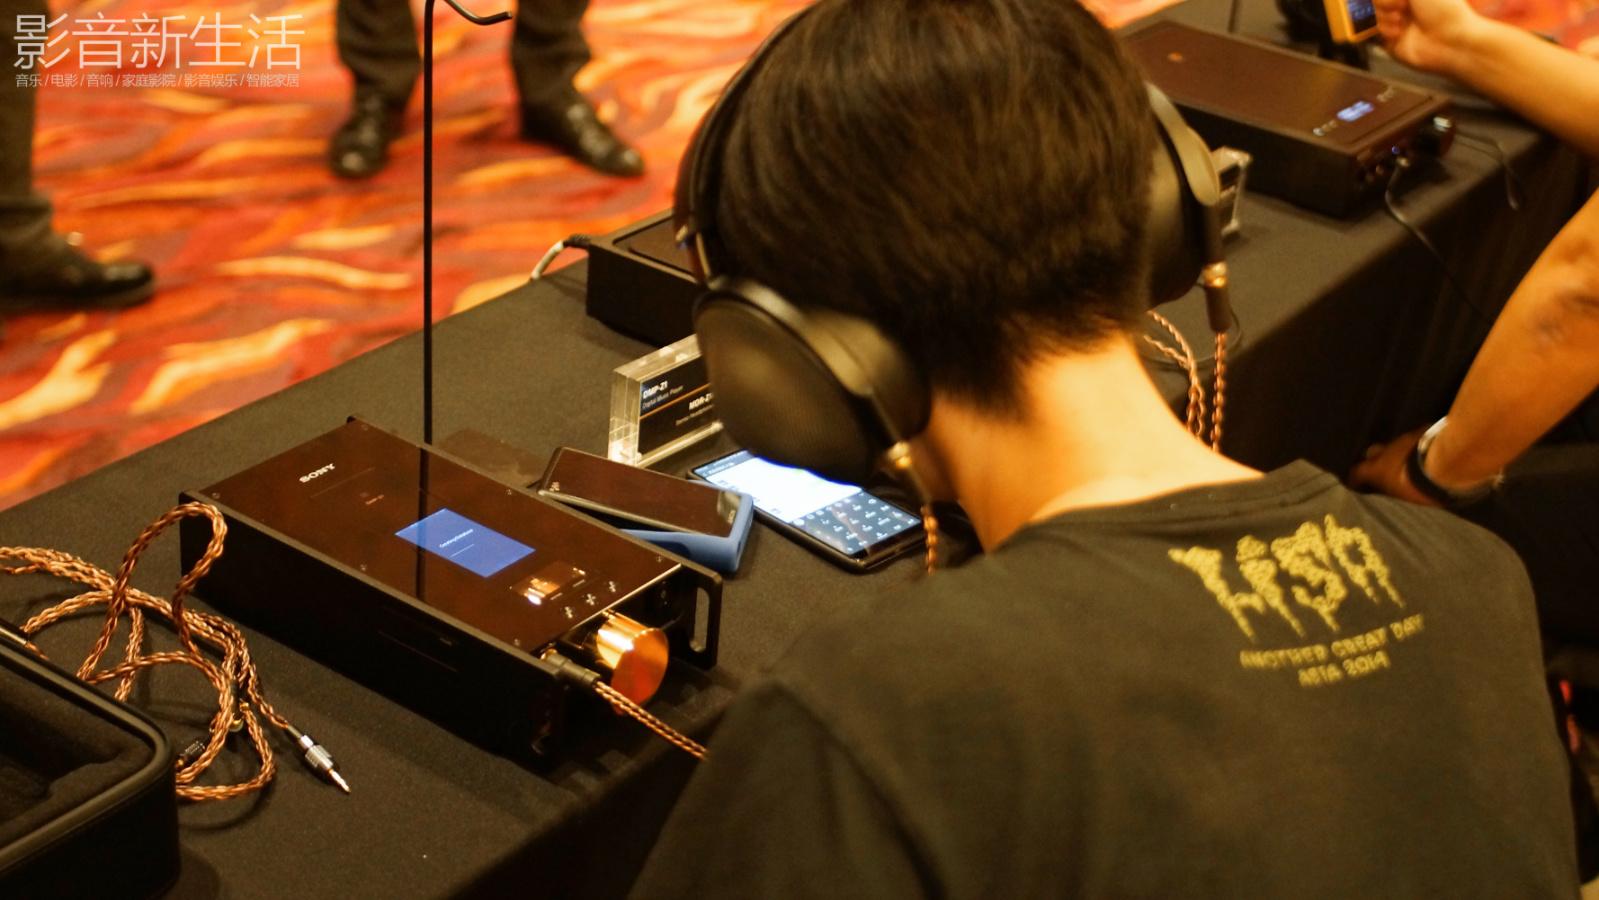 "Sony Hi Res 2018 53 - 新品 | ""重塑随身音乐娱乐王朝!"":Sony索尼发布Signature醇音系列新兄弟IER-Z1R和DMP-Z1,以及舞台监听耳机系列:IER-M7和IER-M9,还有升级款MDR-Z7M2!"